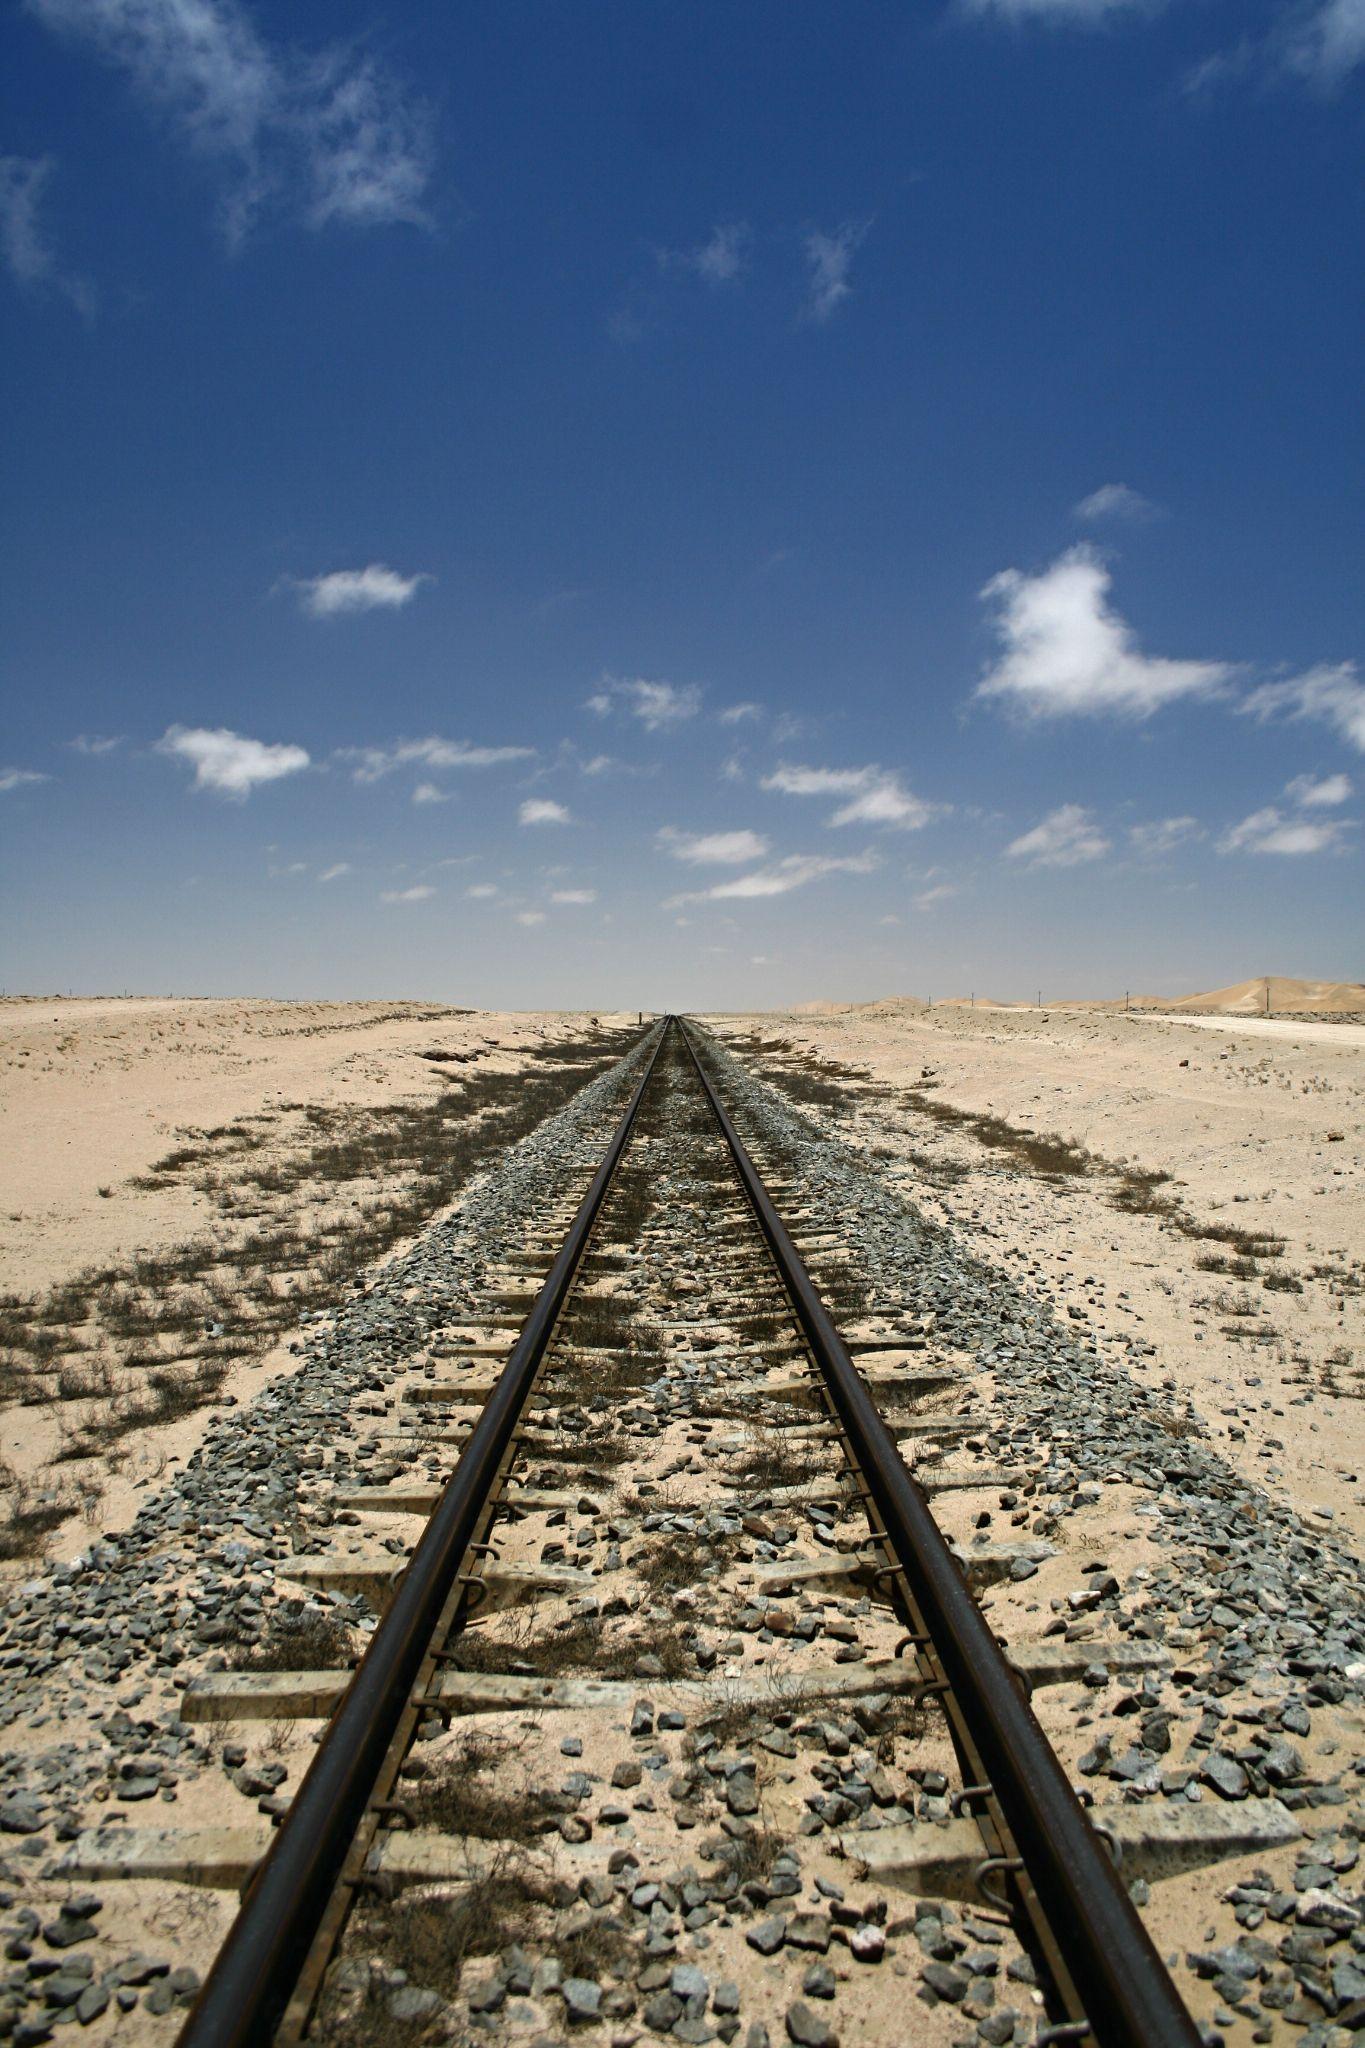 Desert Express by Jo-Ann de Smit